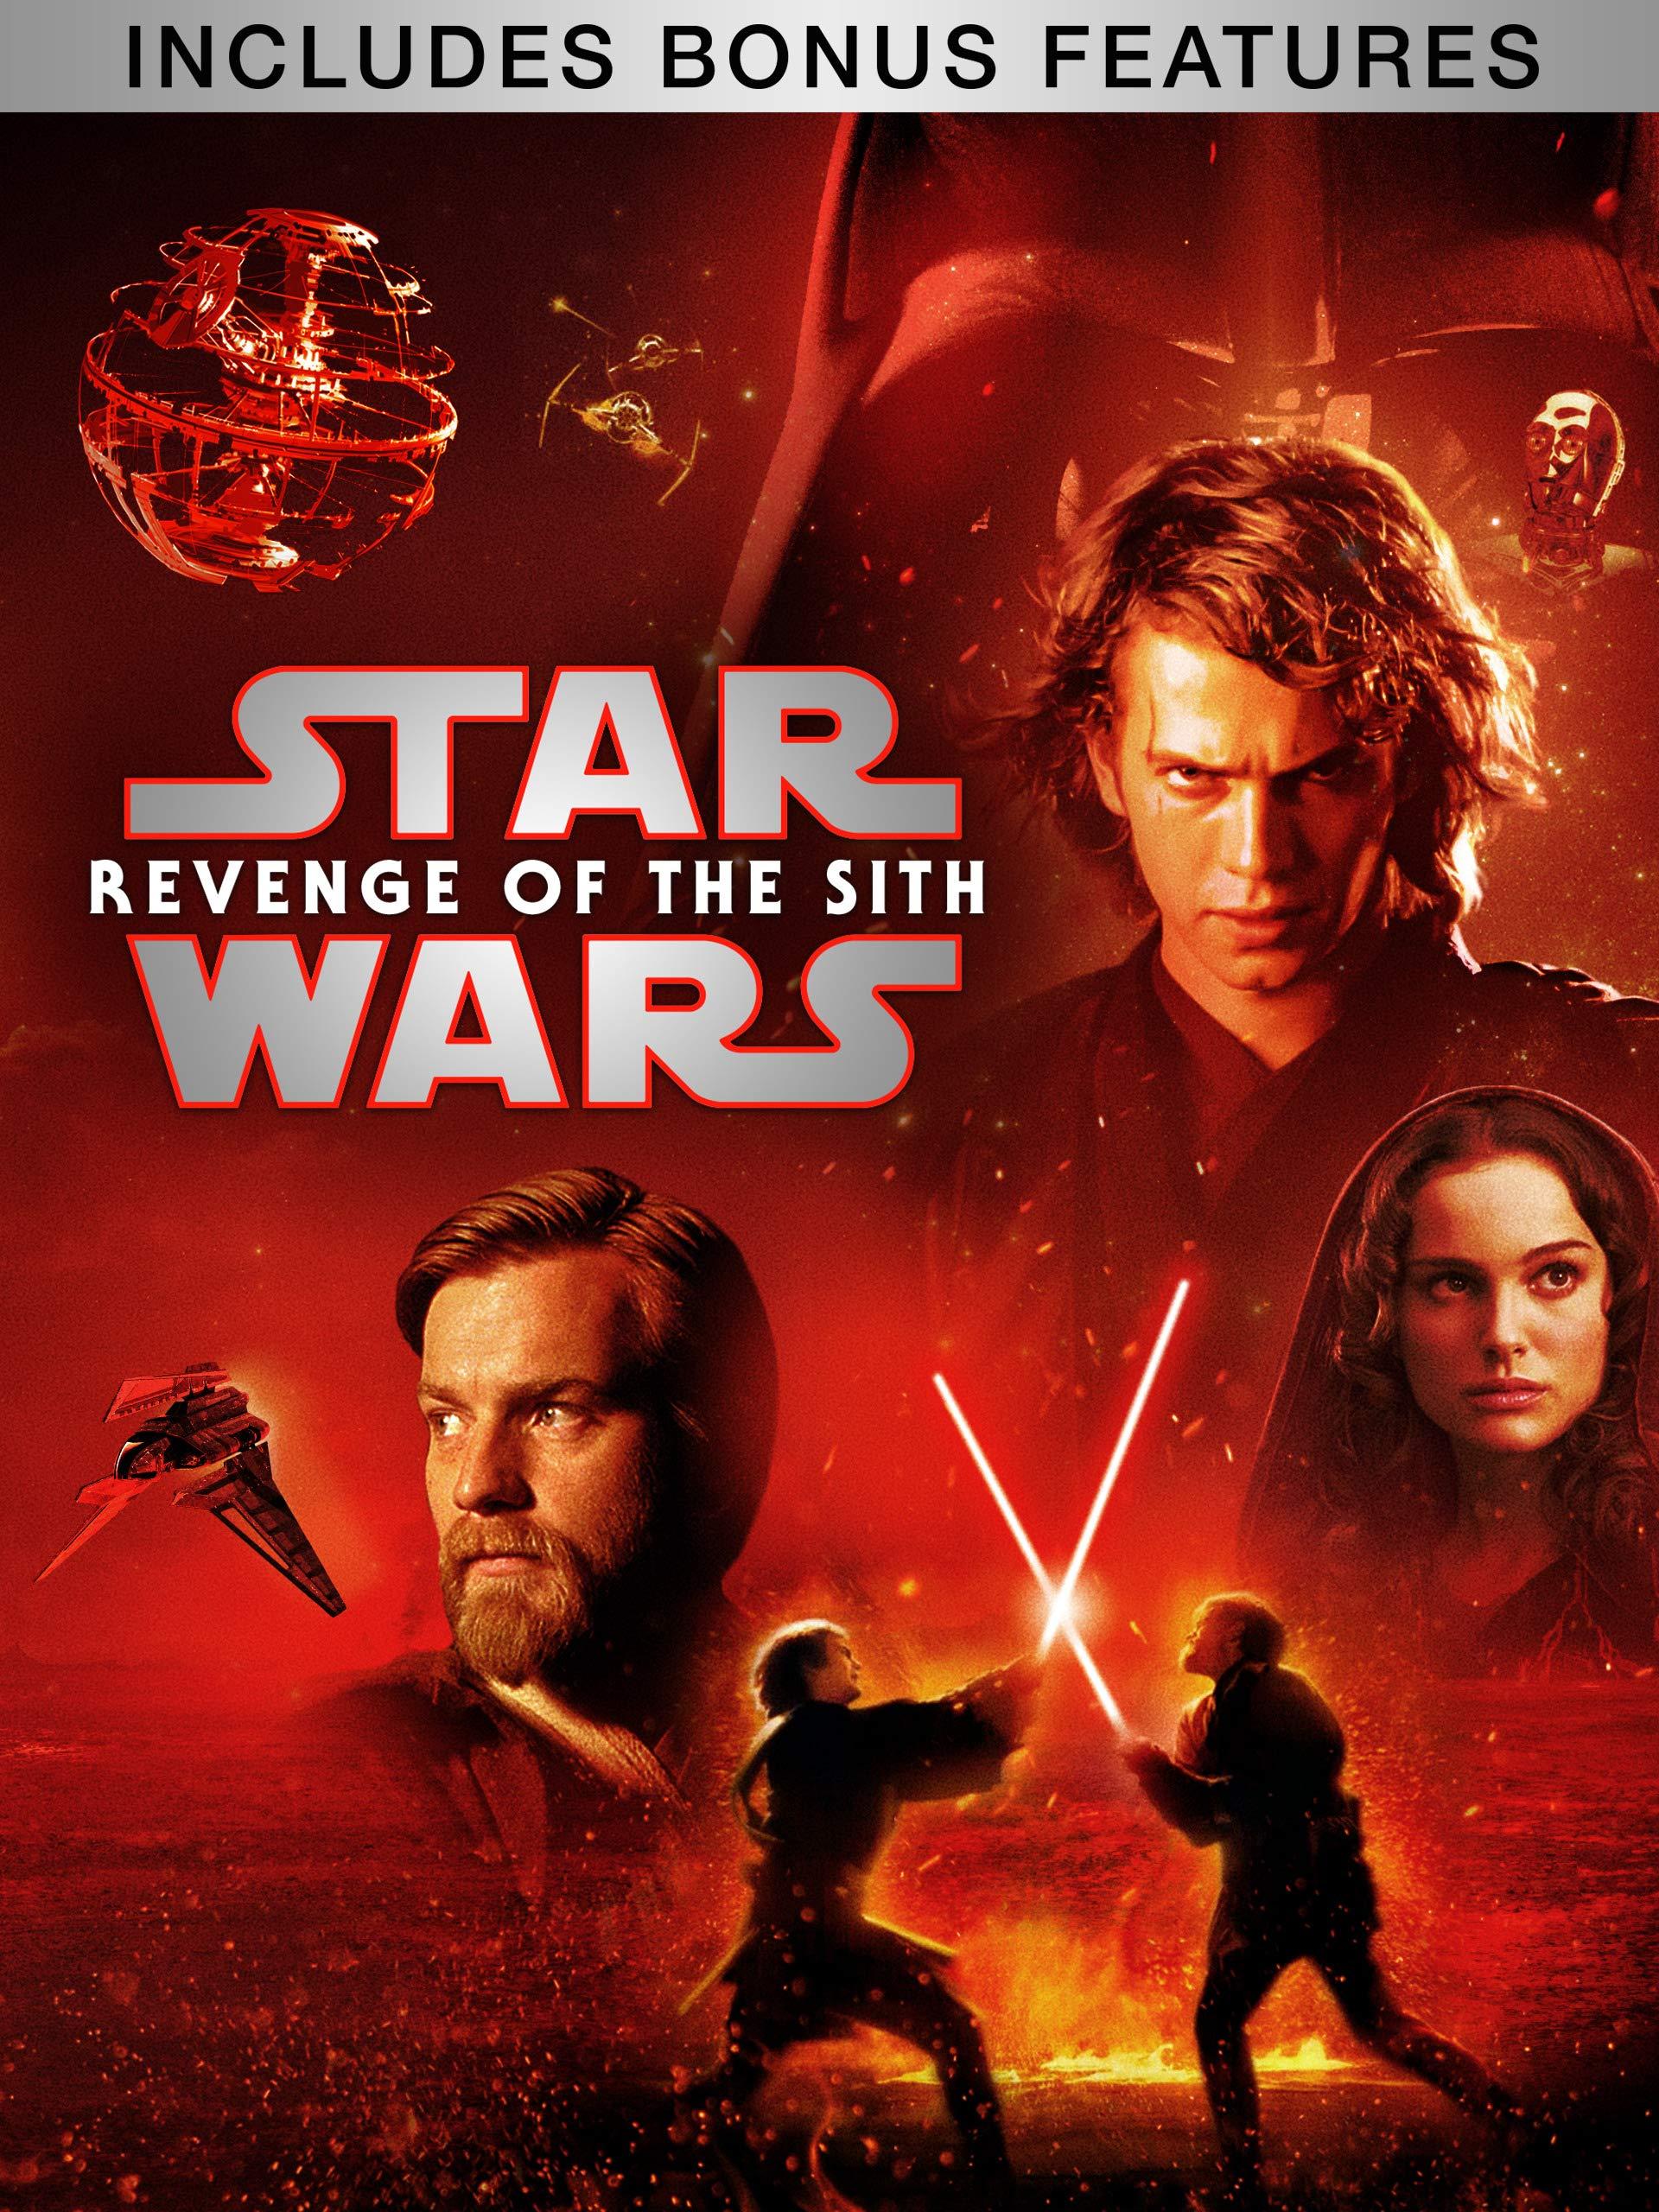 Watch Star Wars Revenge Of The Sith Plus Bonus Content Prime Video